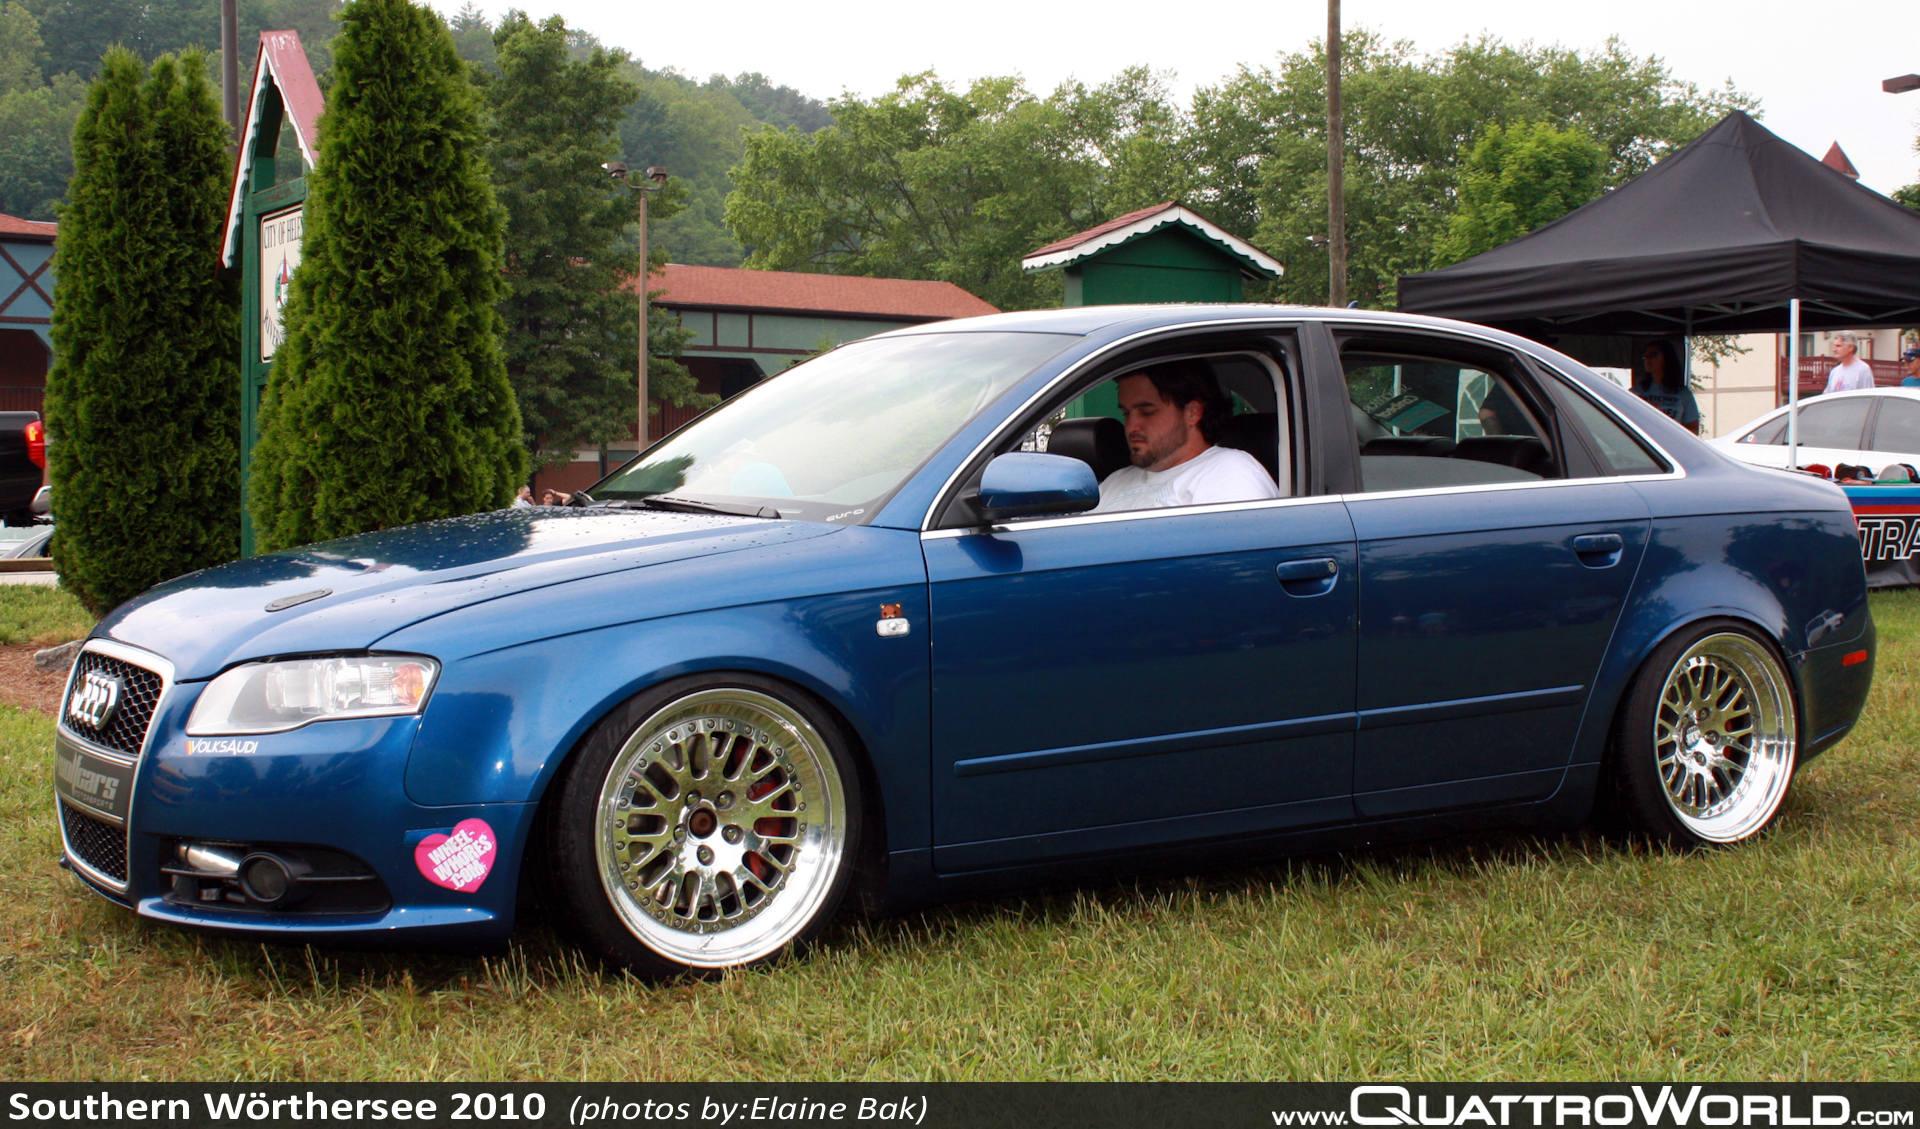 AUDI A4 blue